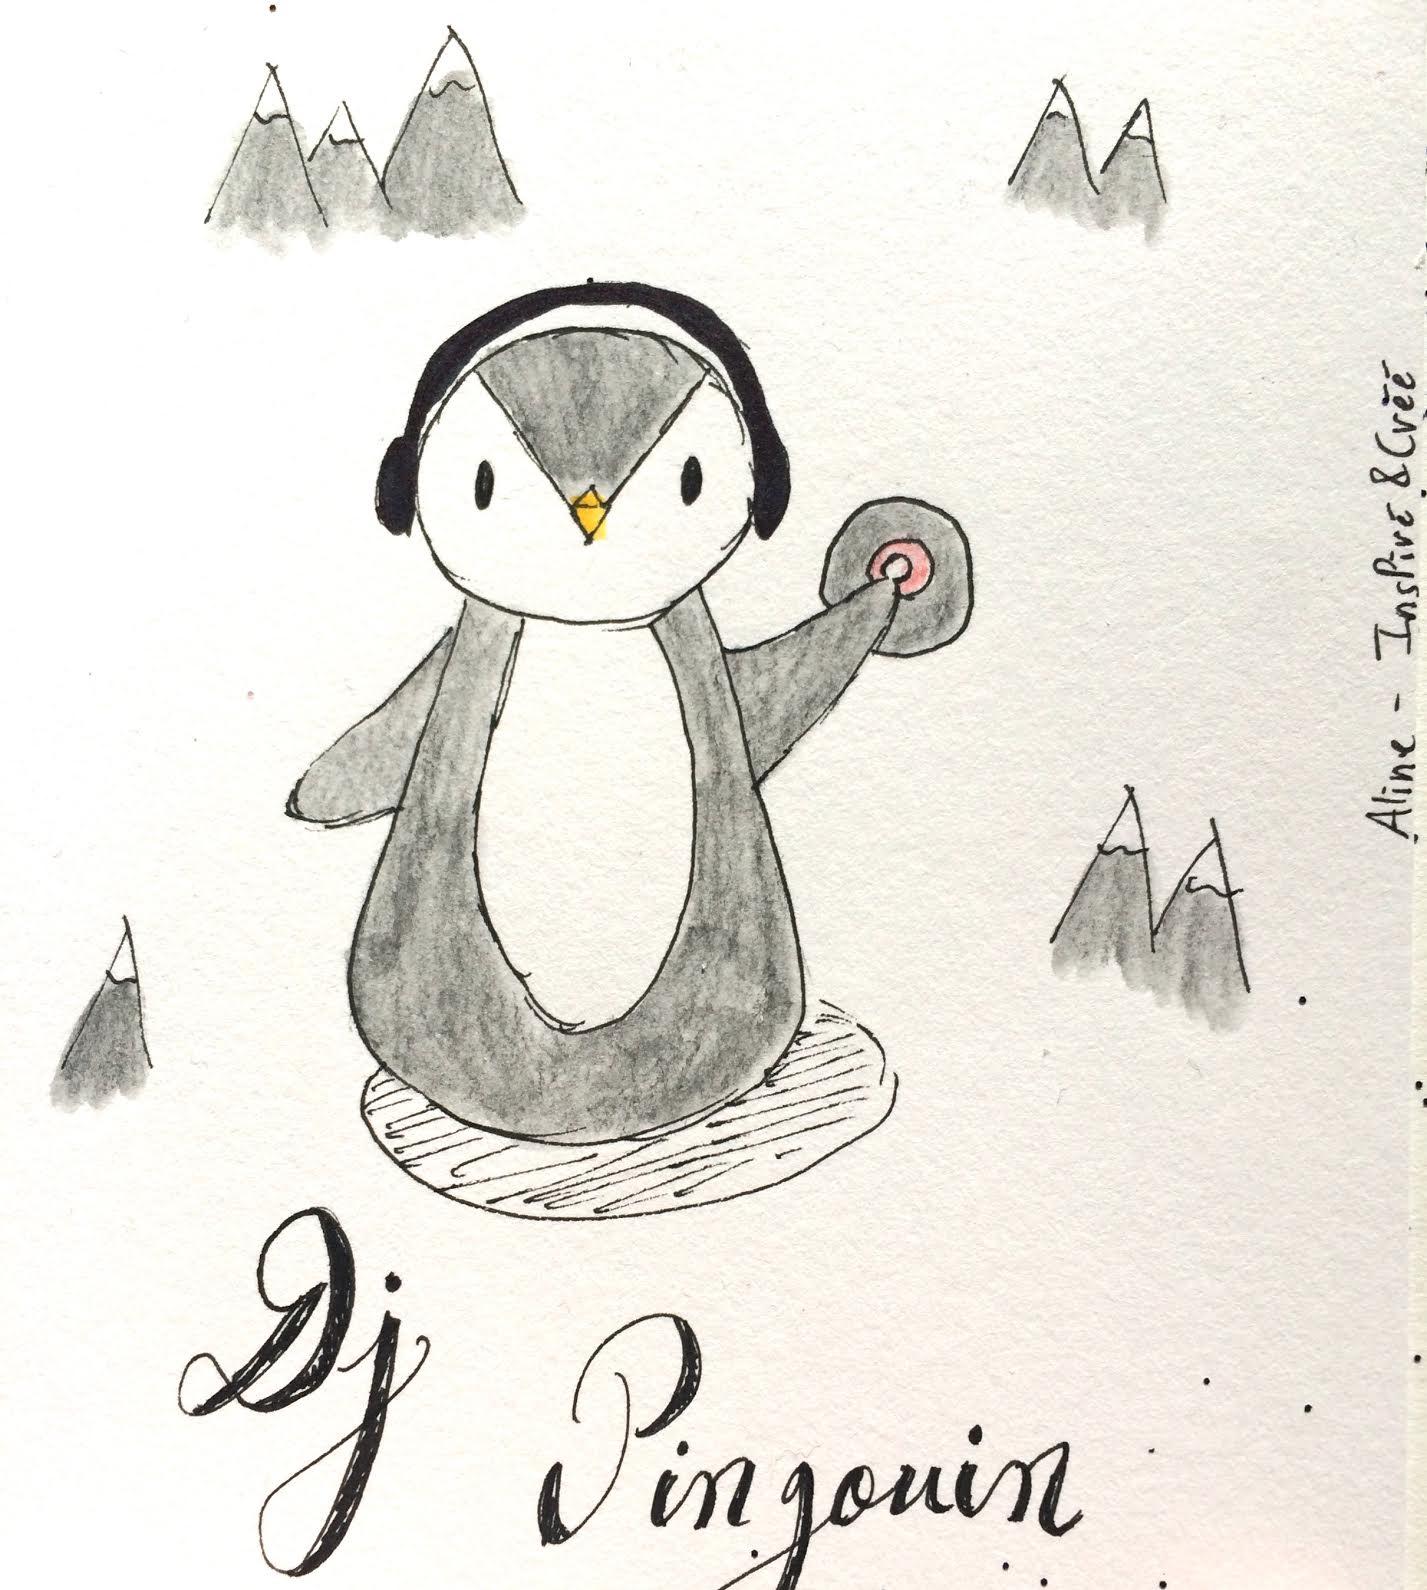 pingouins-2